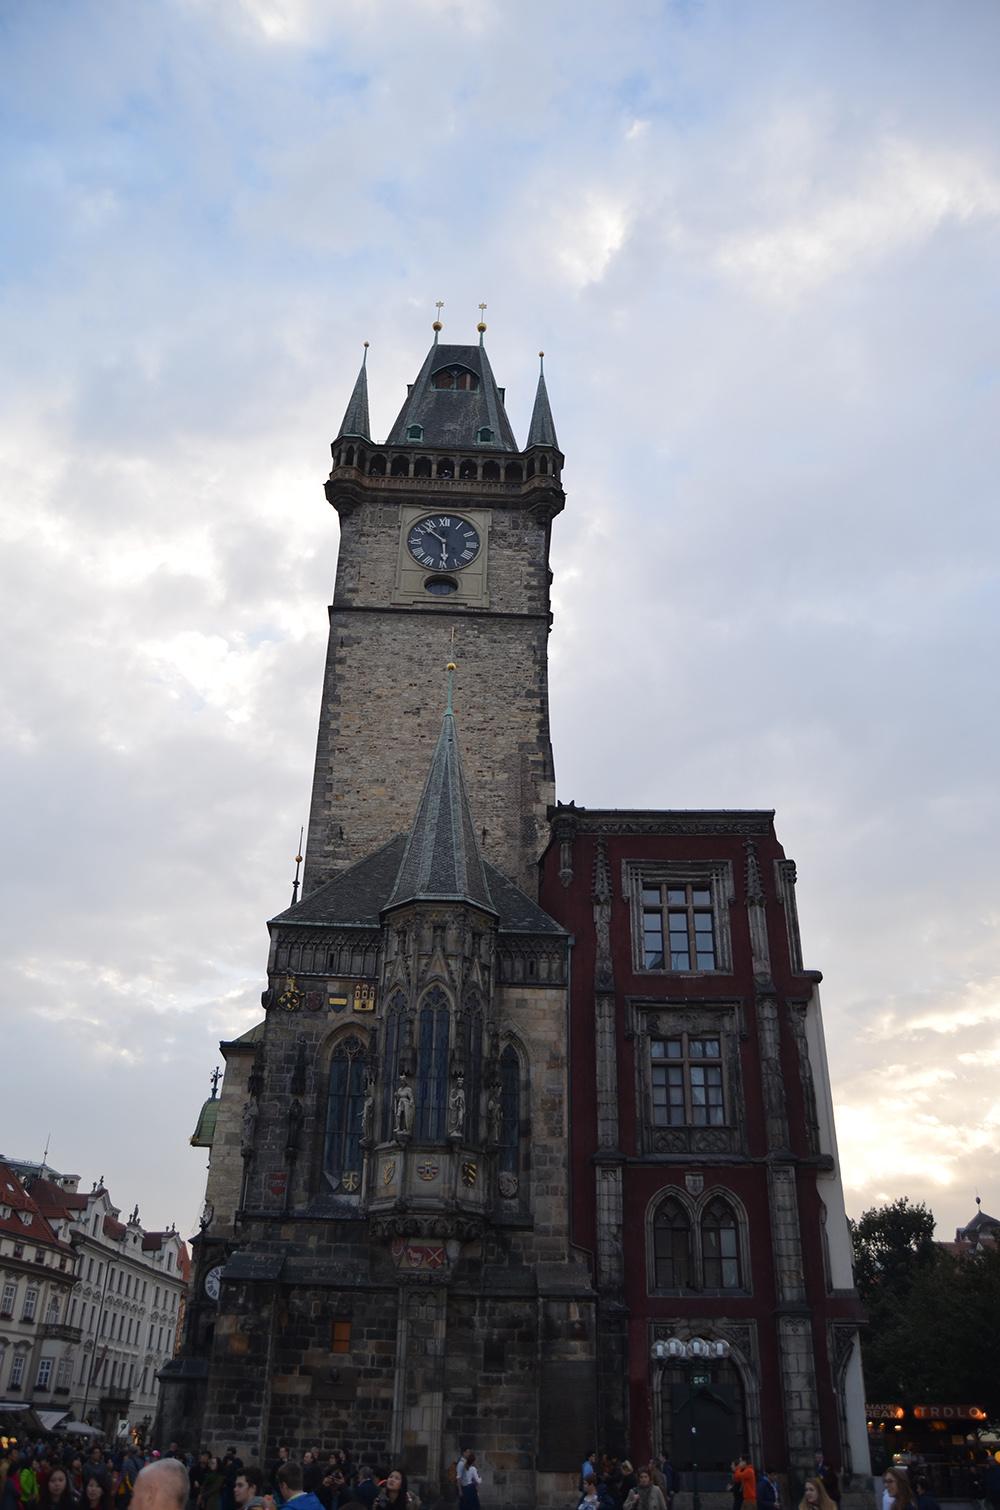 prag seyahat rehberi prag seyahat rehberi Prag Seyahat Rehberi prag 09